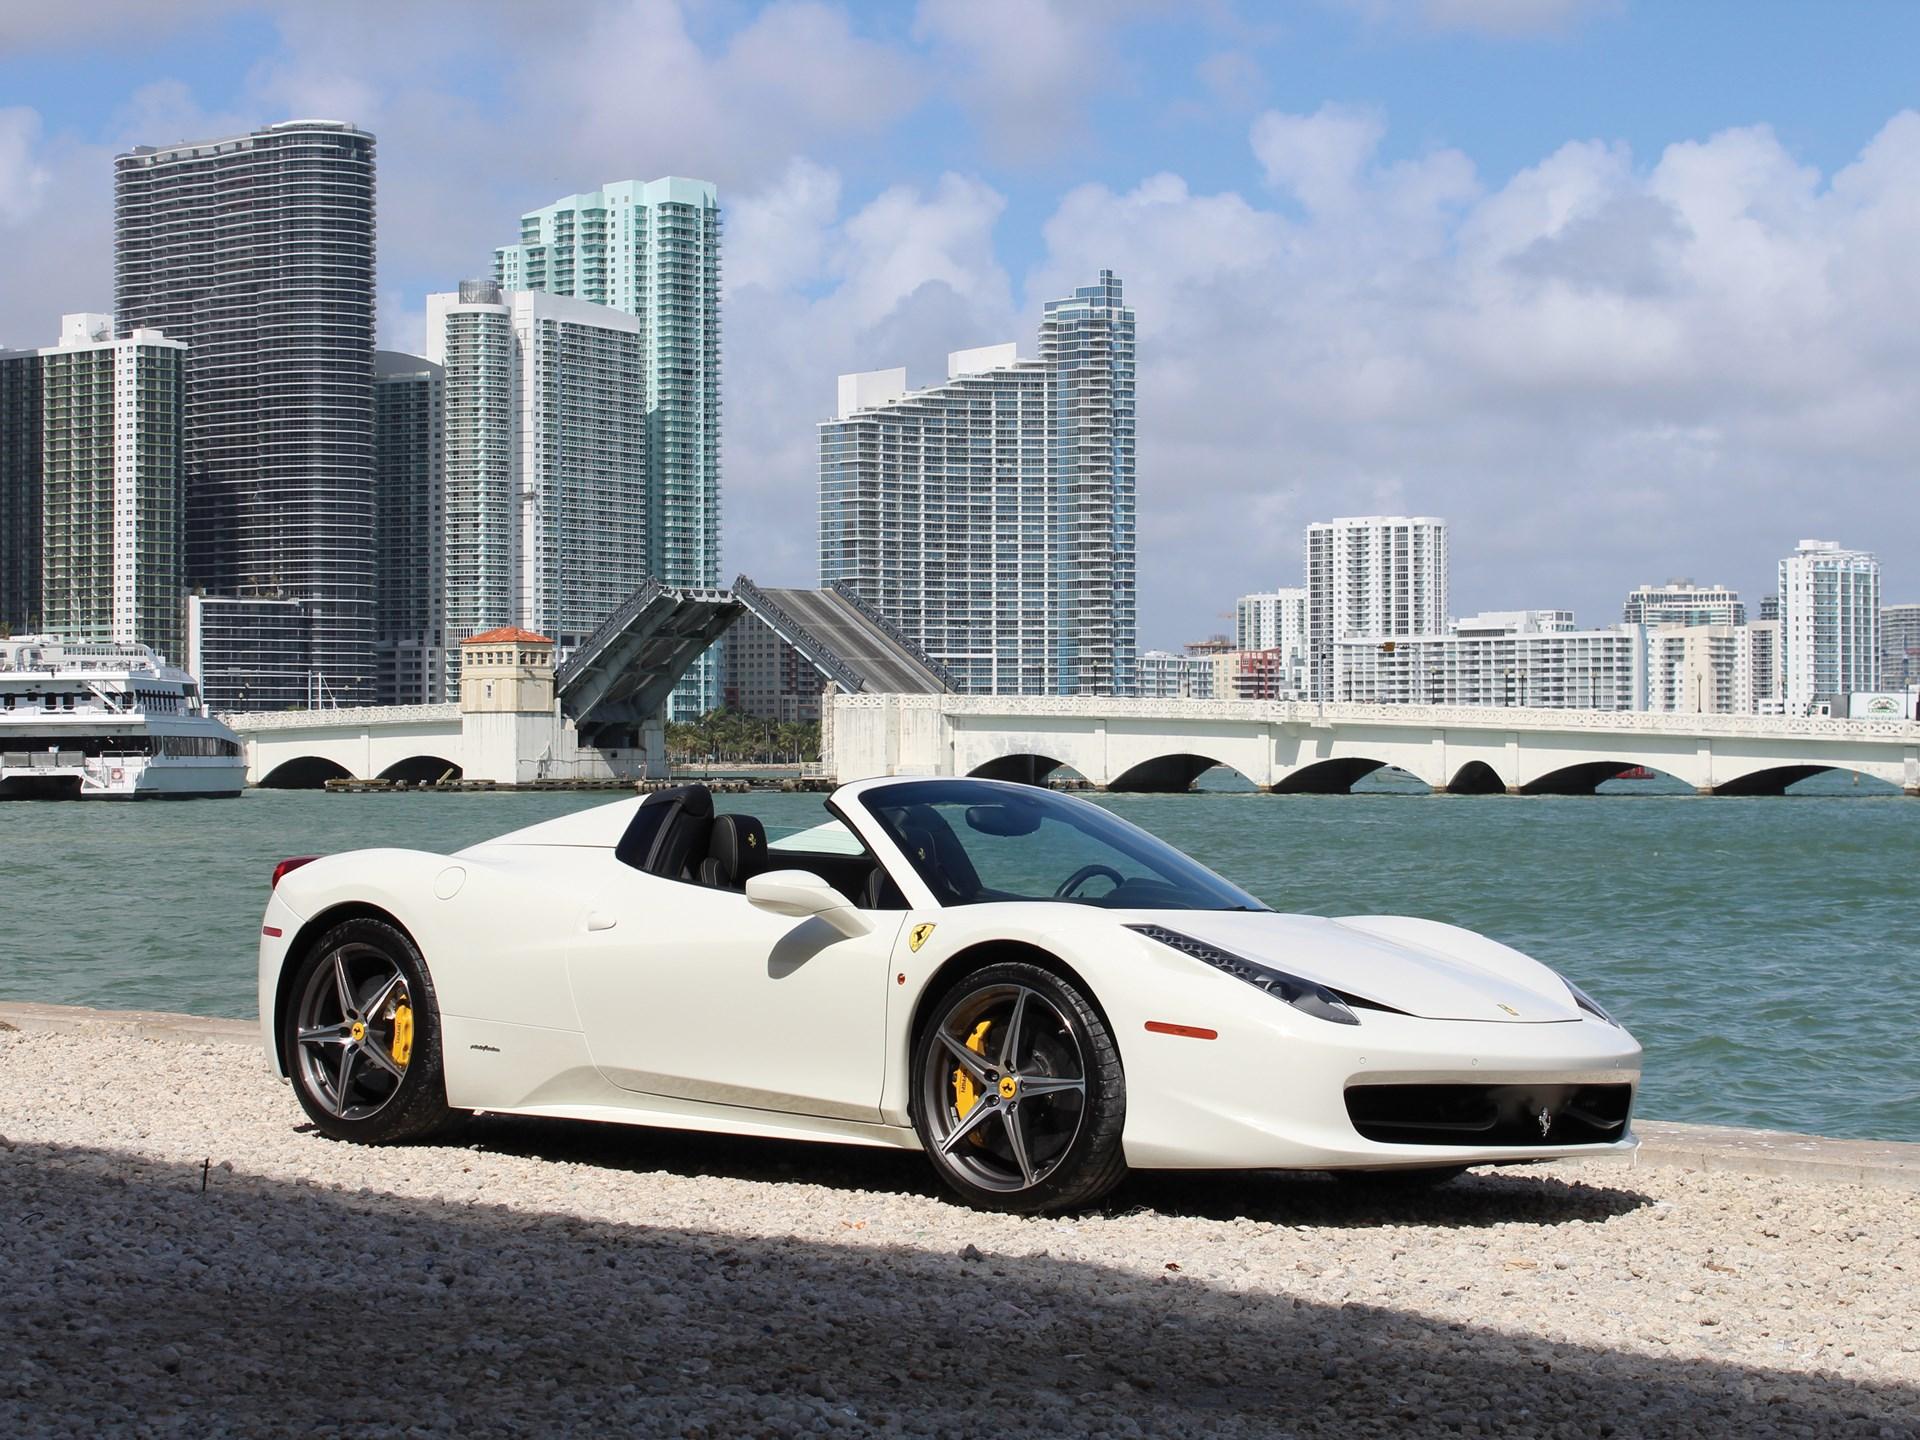 2014 Ferrari 458 Spider >> Rm Sotheby S 2014 Ferrari 458 Spider Fort Lauderdale 2018